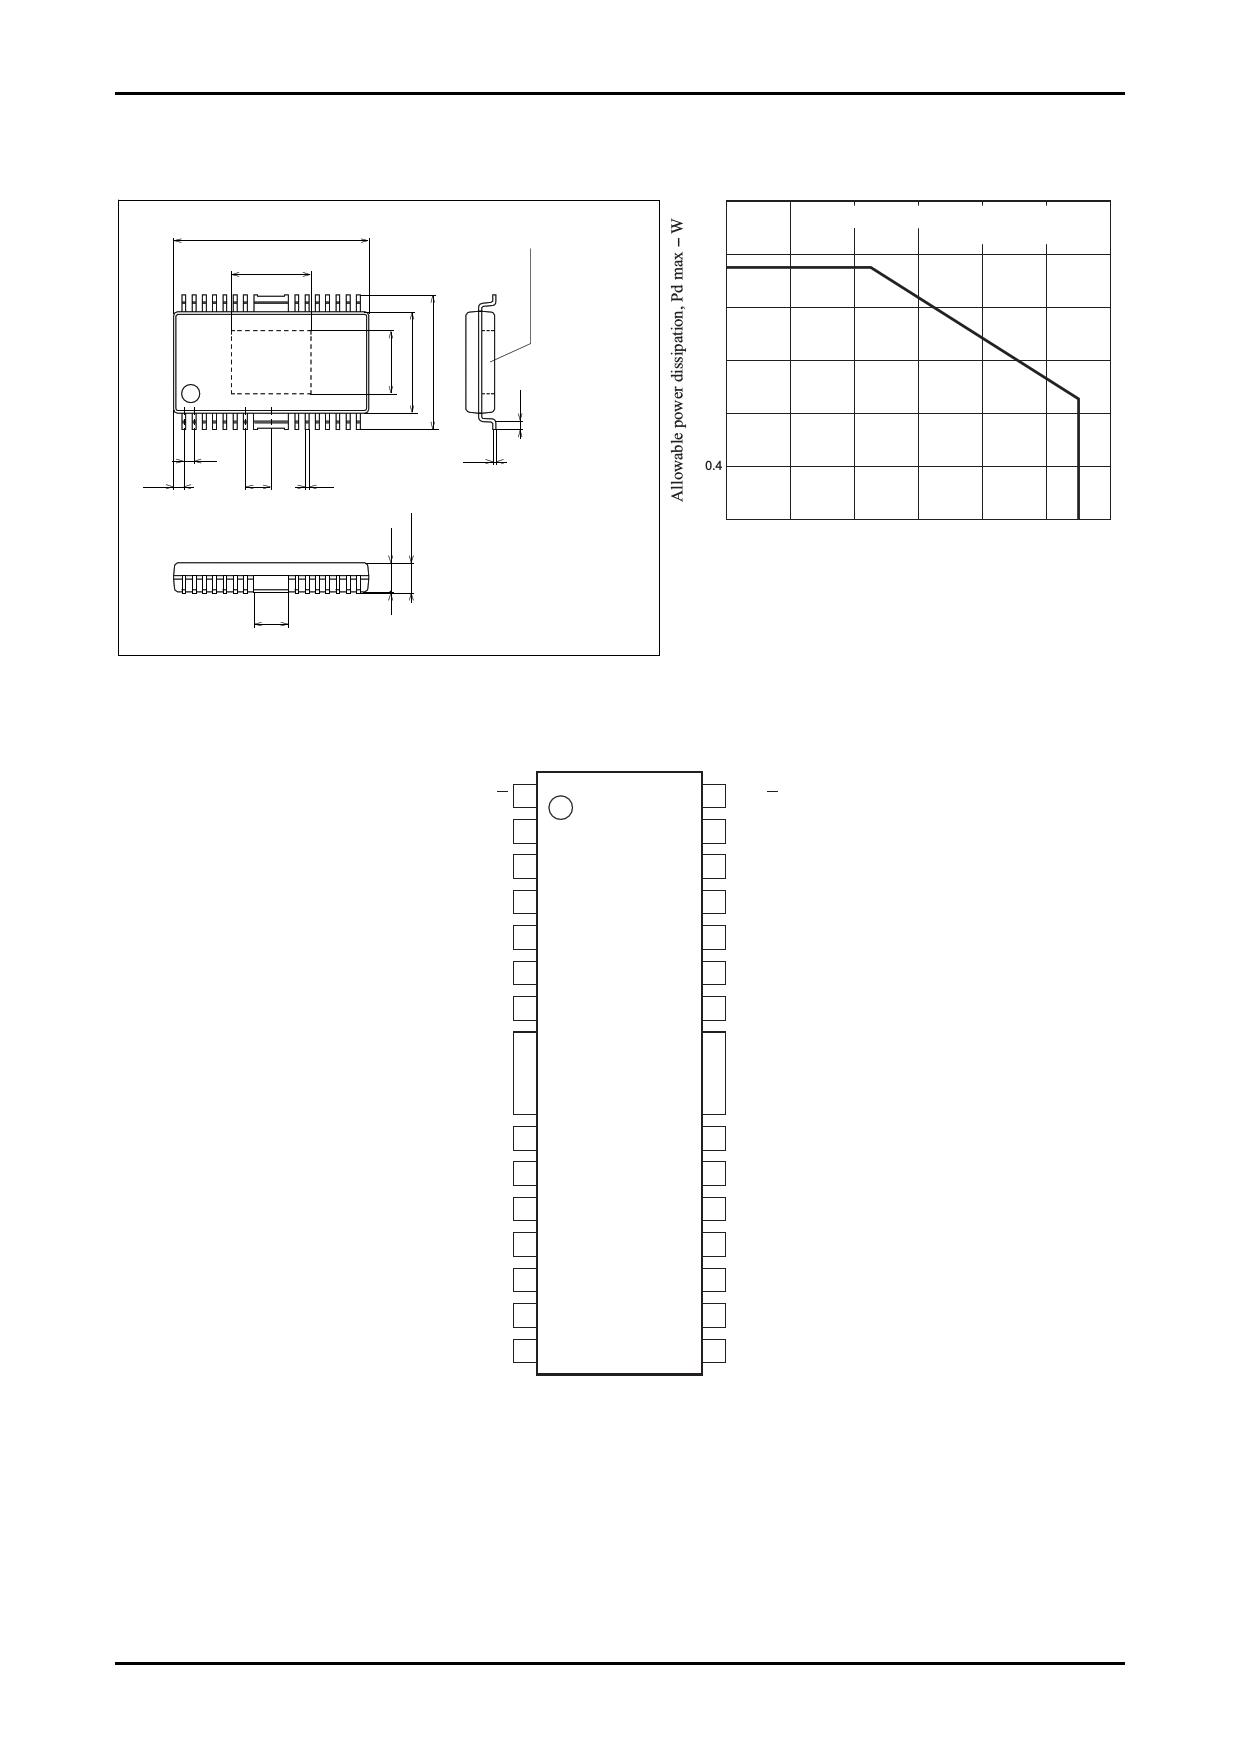 LB1945H pdf, ピン配列